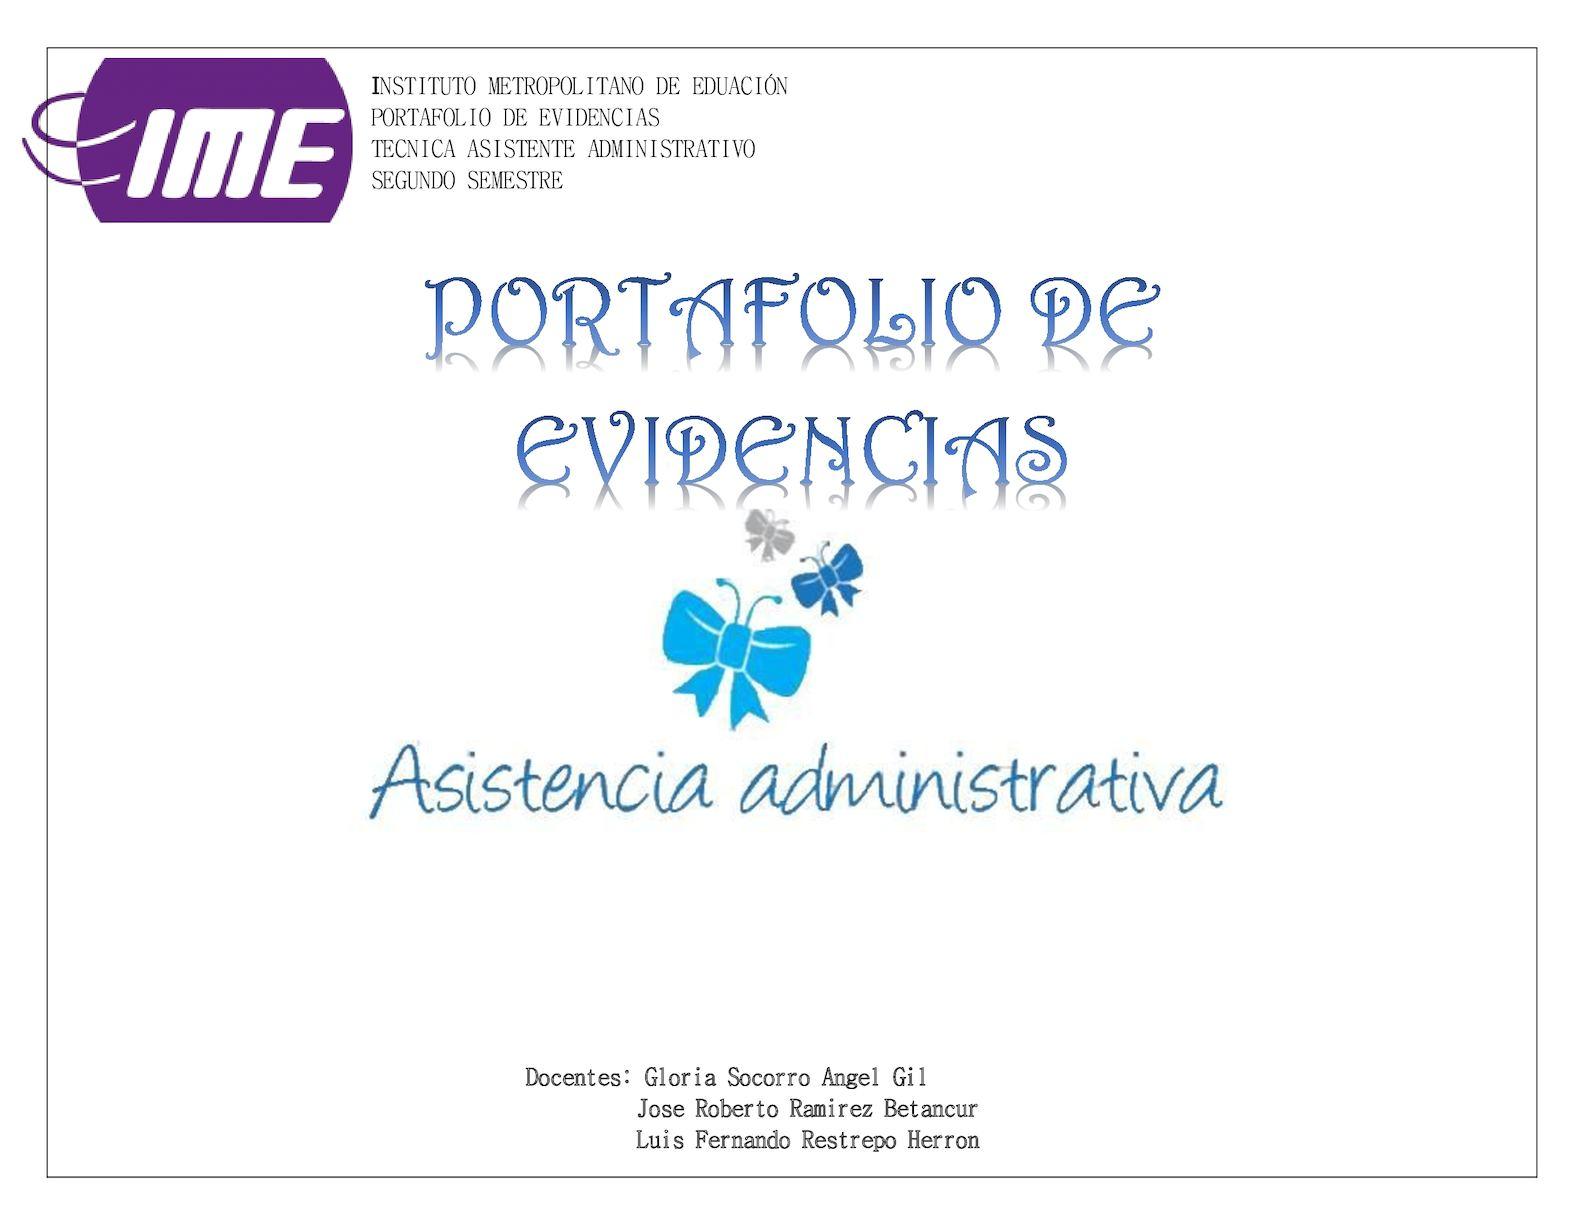 Calaméo - Portafolio De Evidencias II SEMESTRE